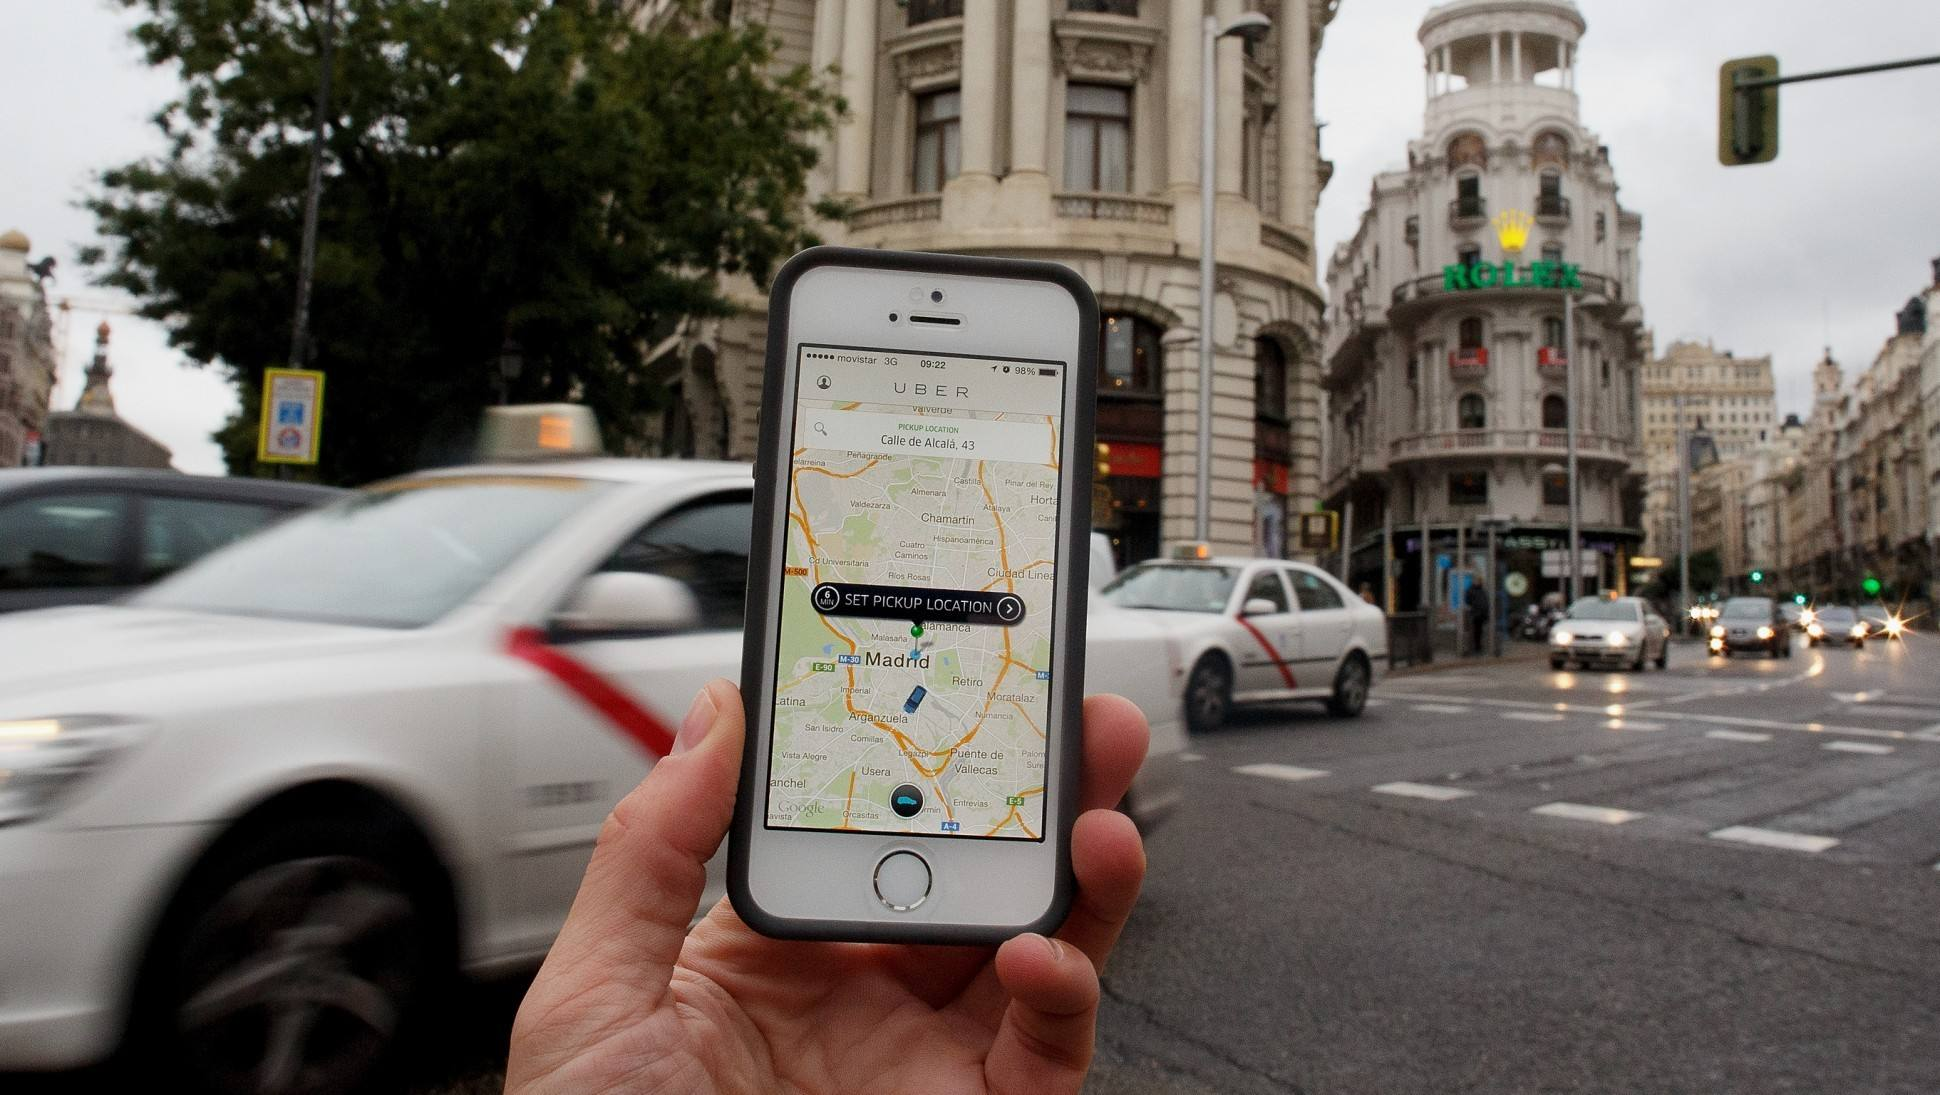 Uber:正在接受美国国税局的税务审查